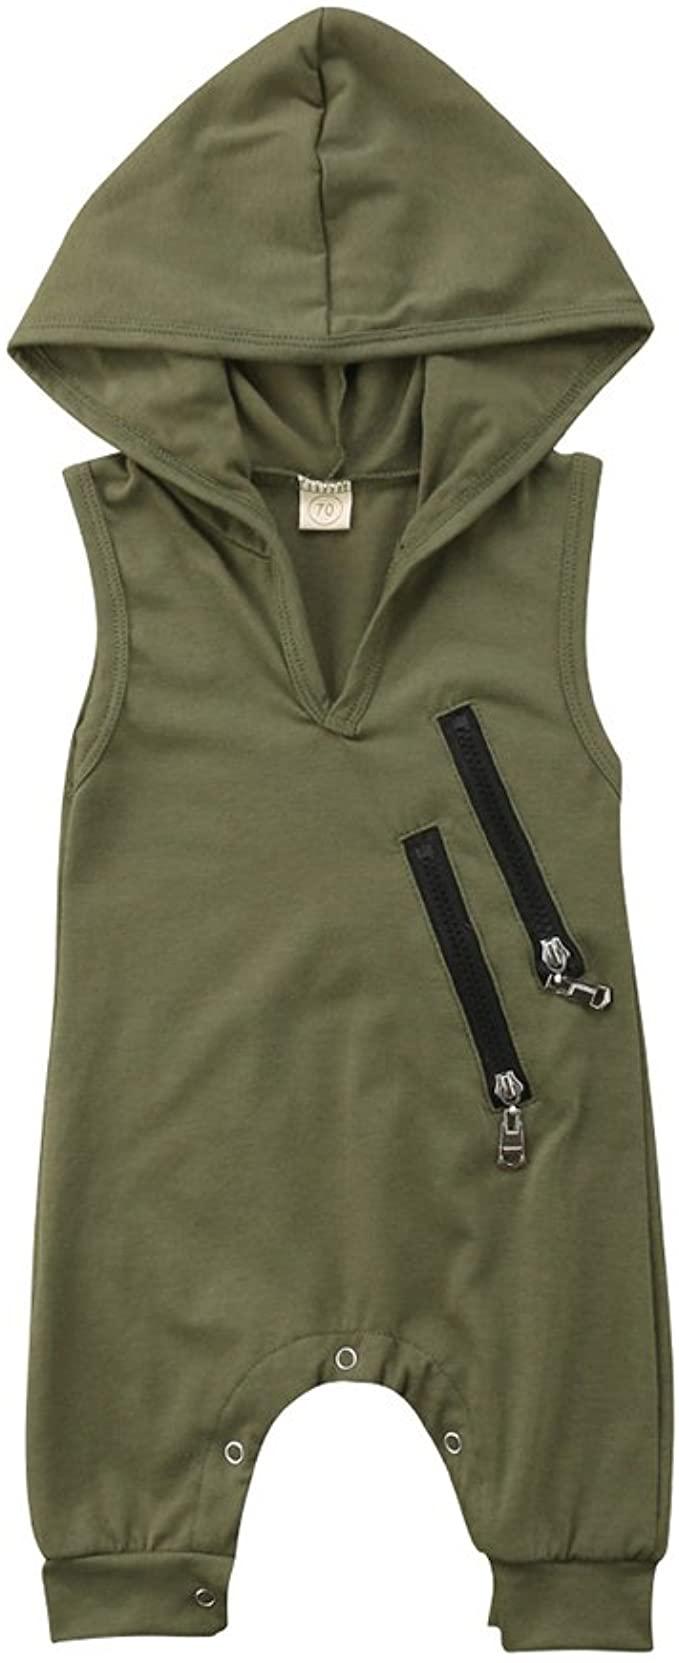 Sleeveless Newborn Baby Boys Girls Hooded Romper Green Jumpsuit Outfit Summer Zipper Casual Clothes